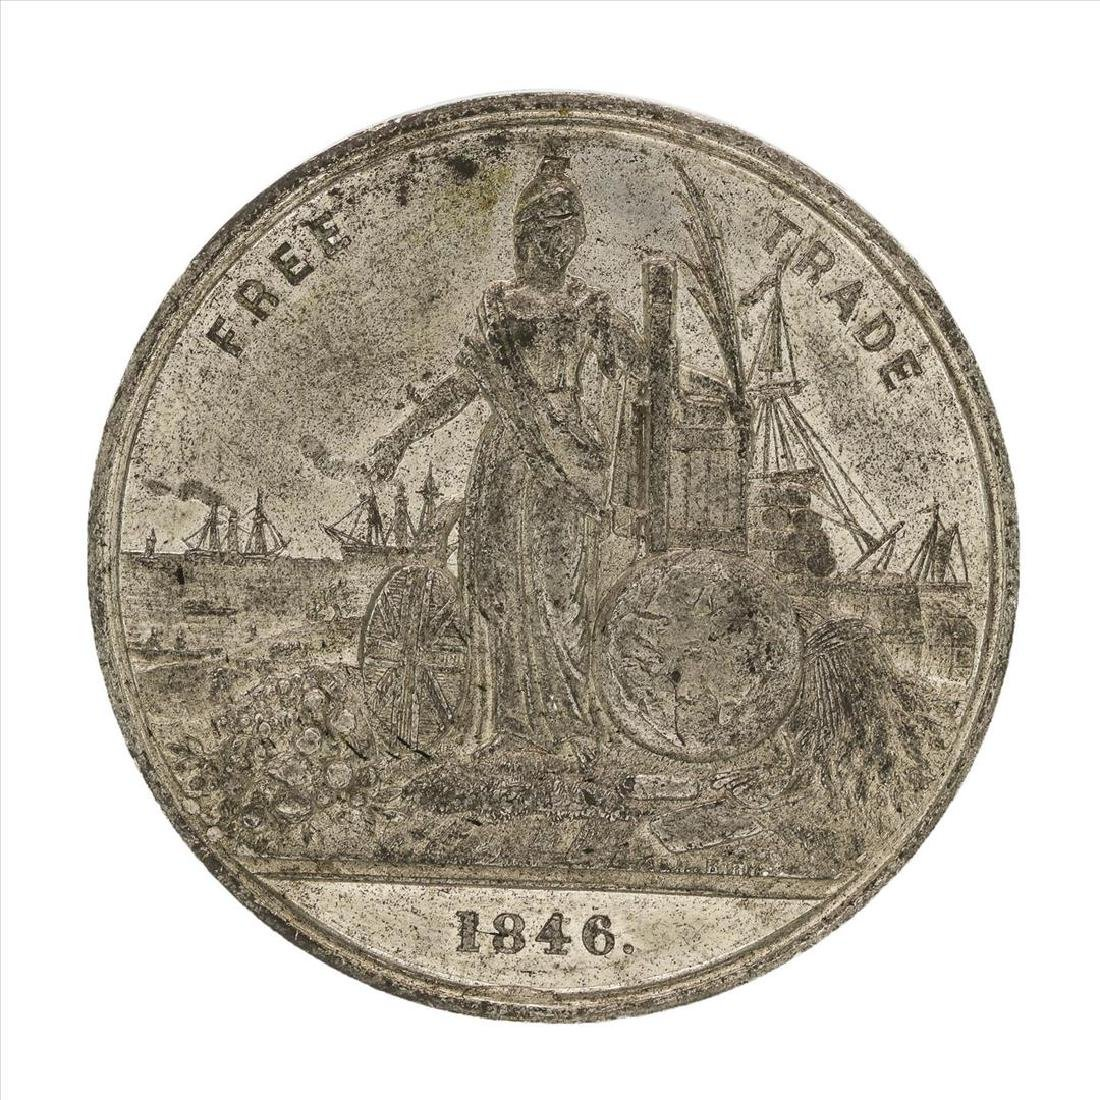 1846 Free Trade Anti-Corn Law League Medal